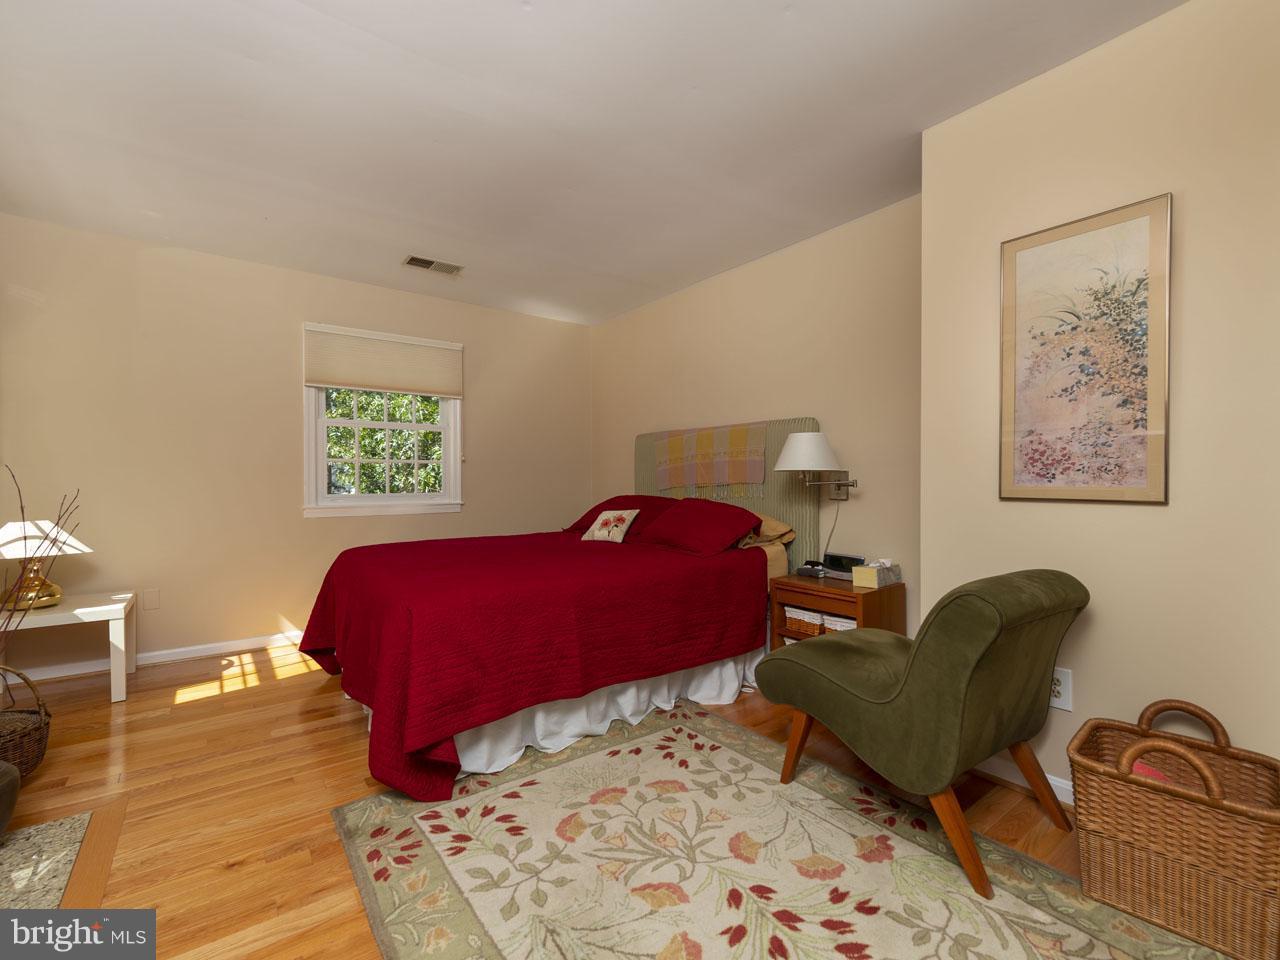 1006211278-300688039176-2021-07-22-07-39-39        Burke Delaware Real Estate For Sale   MLS# 1006211278  - Best of Northern Virginia